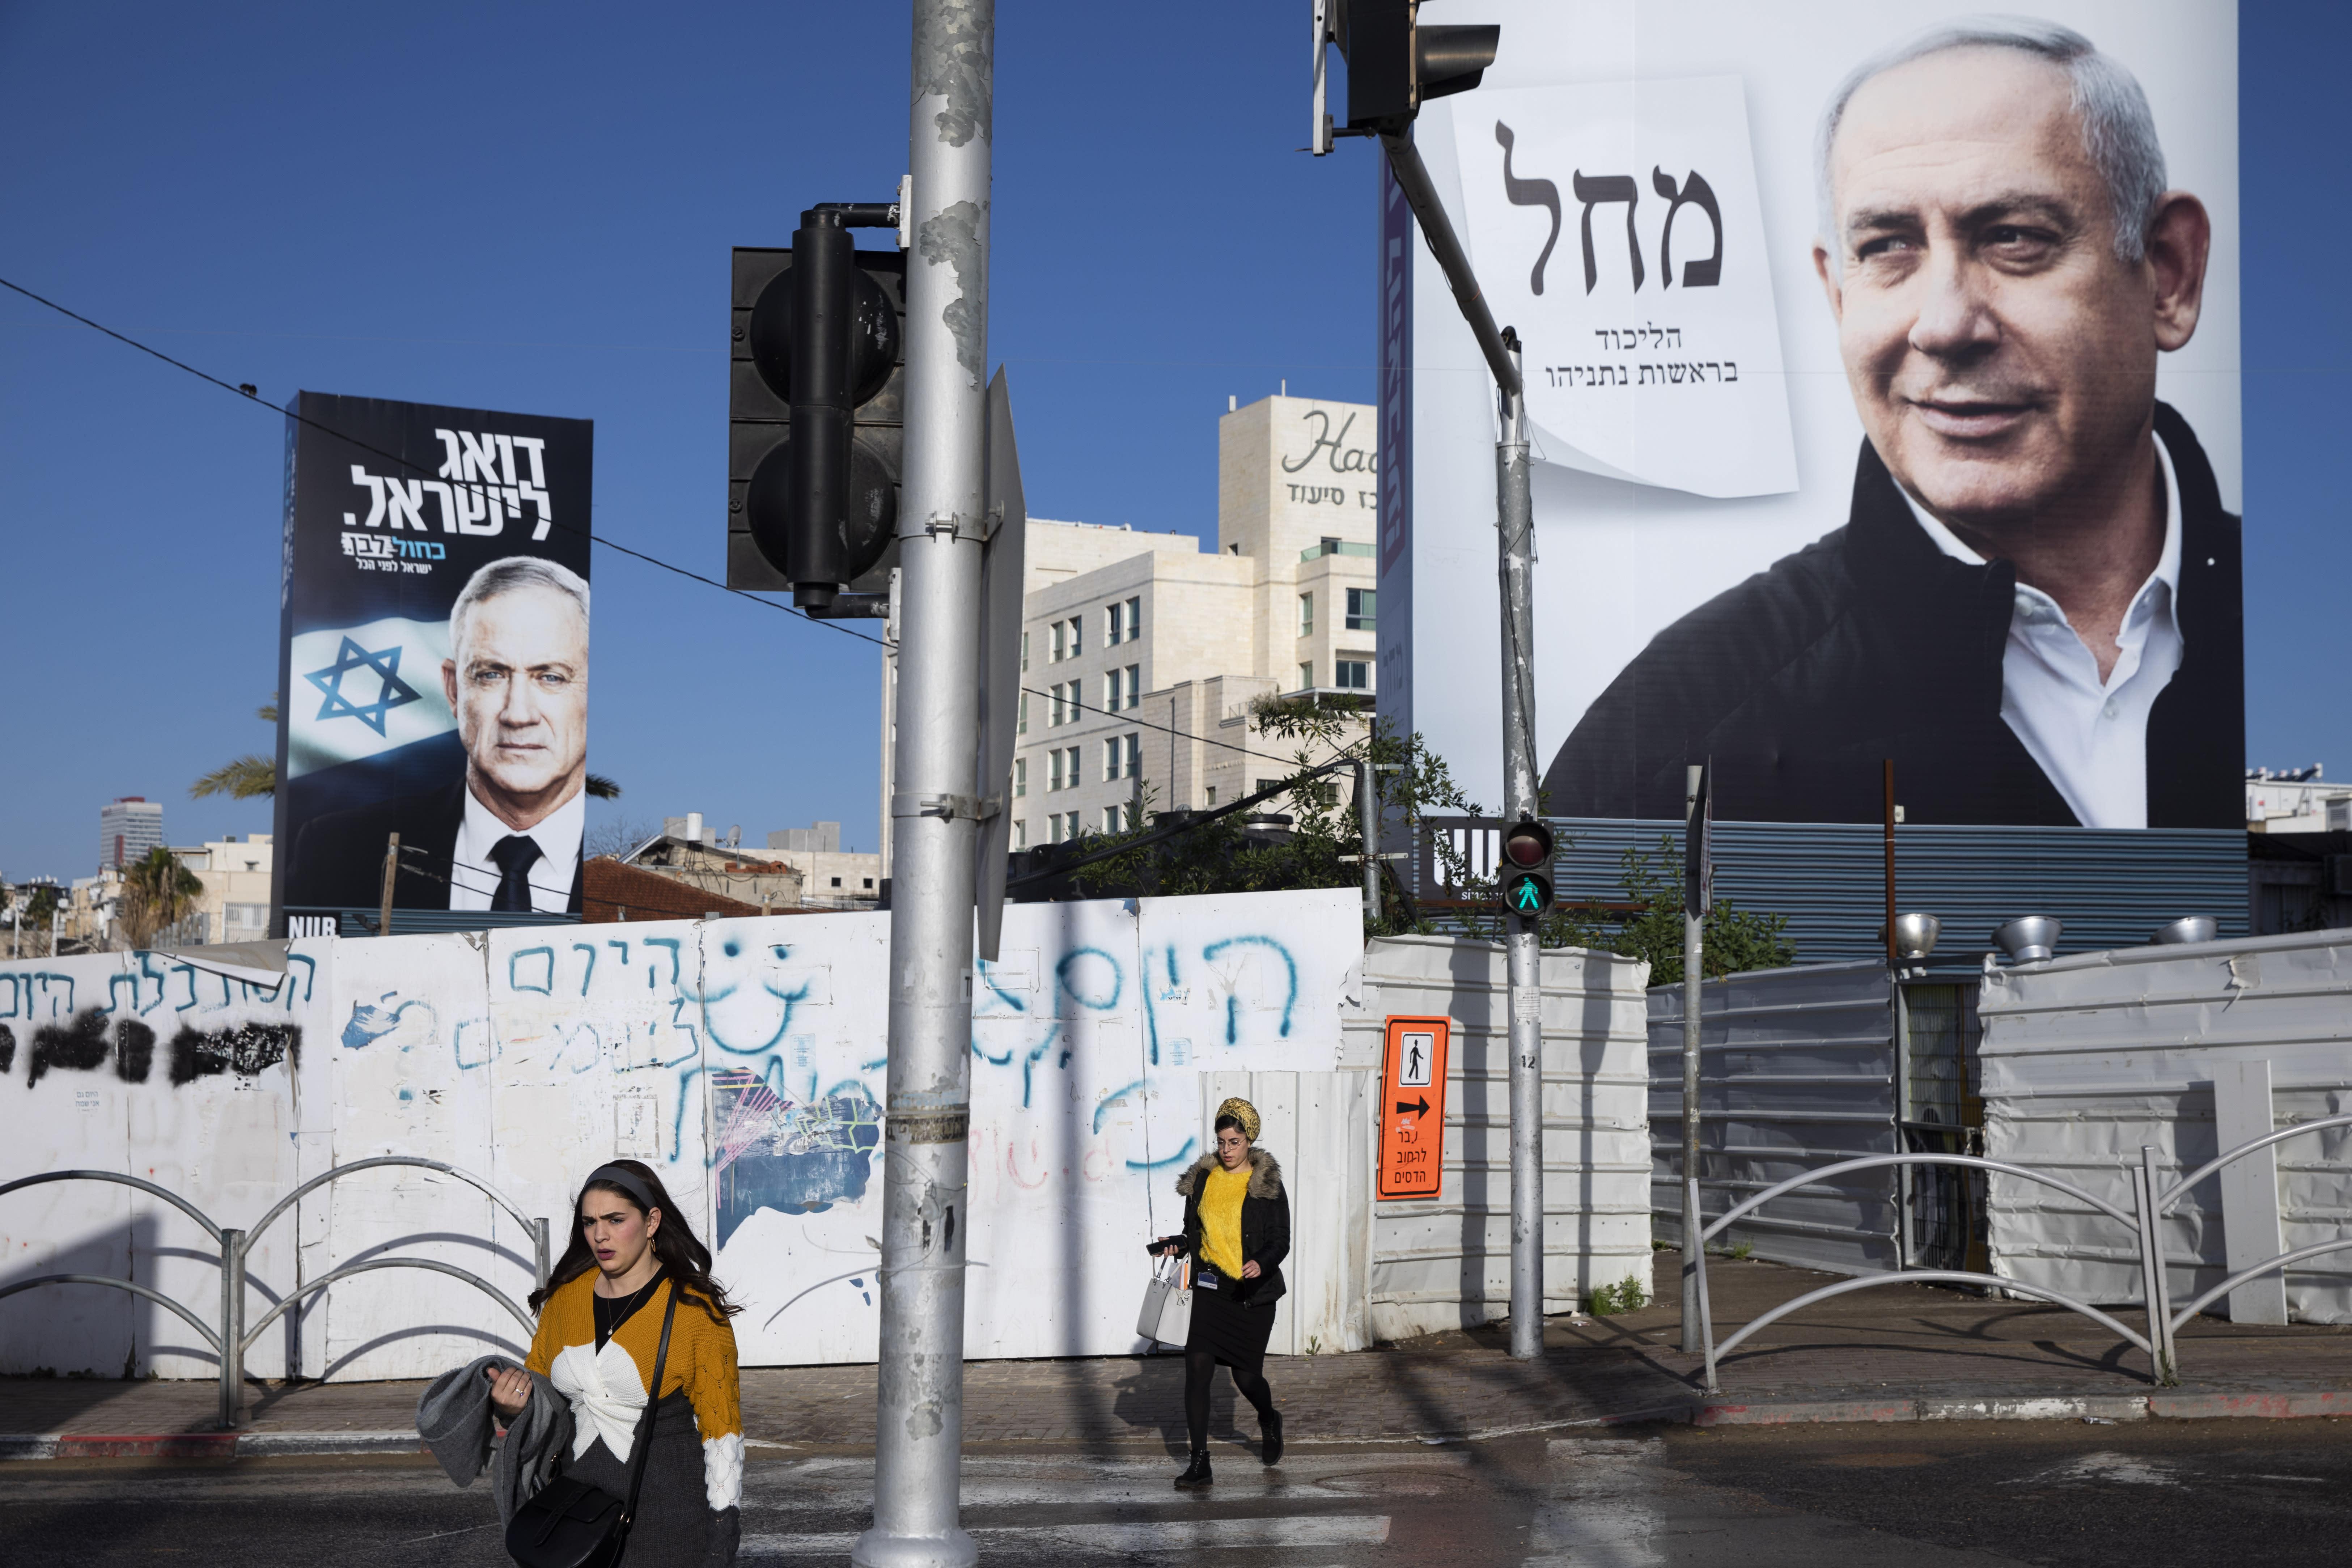 Netanyahu rival Gantz seeks more time to form coalition government